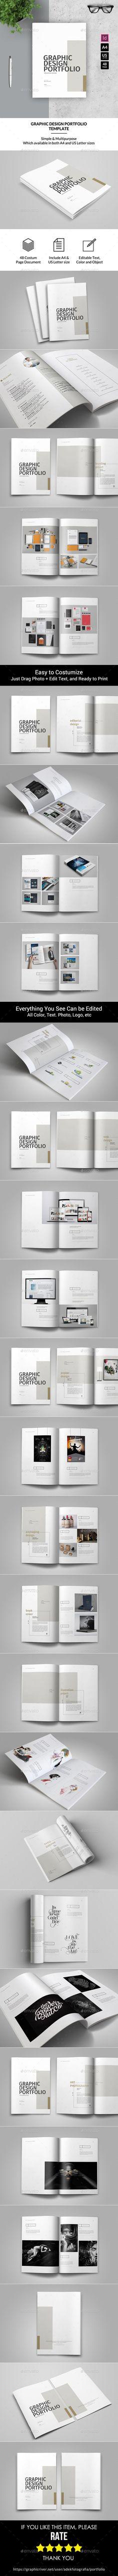 Graphic Design Portfolio Template — InDesign INDD #brochure template #us letter • Download ➝ https://graphicriver.net/item/graphic-design-portfolio-template/19701319?ref=pxcr